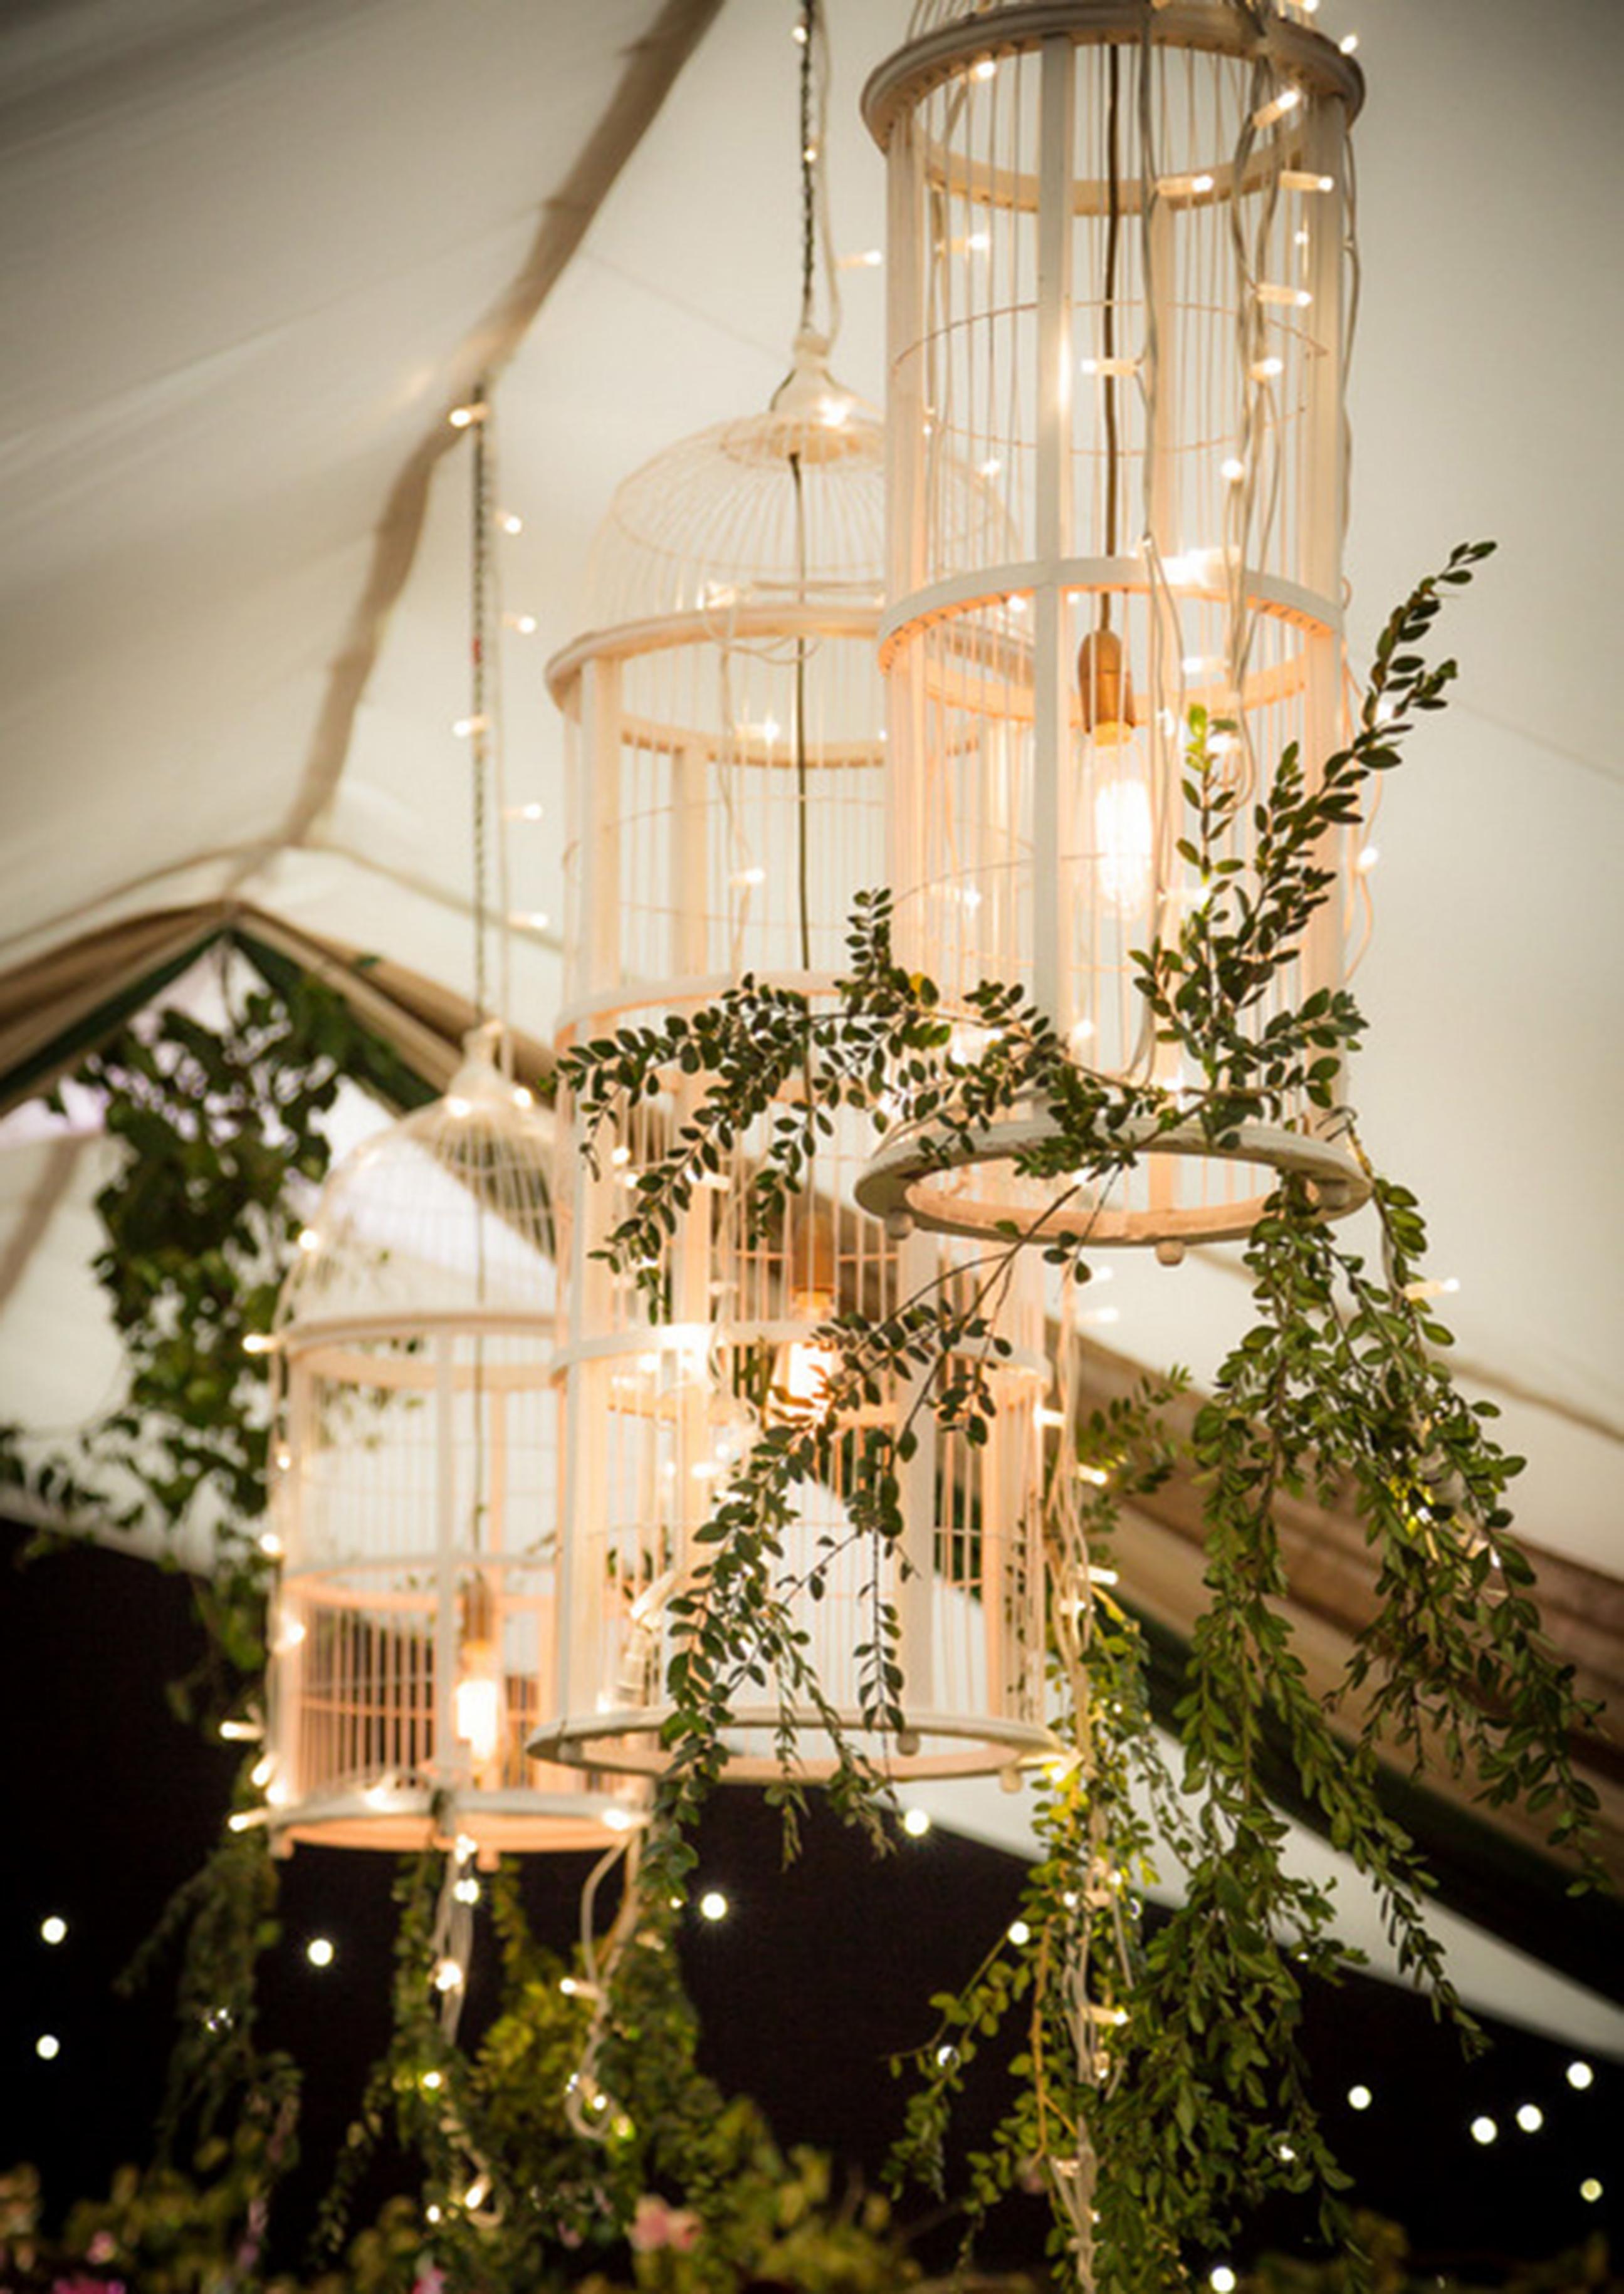 Birdcage Overhead Lights